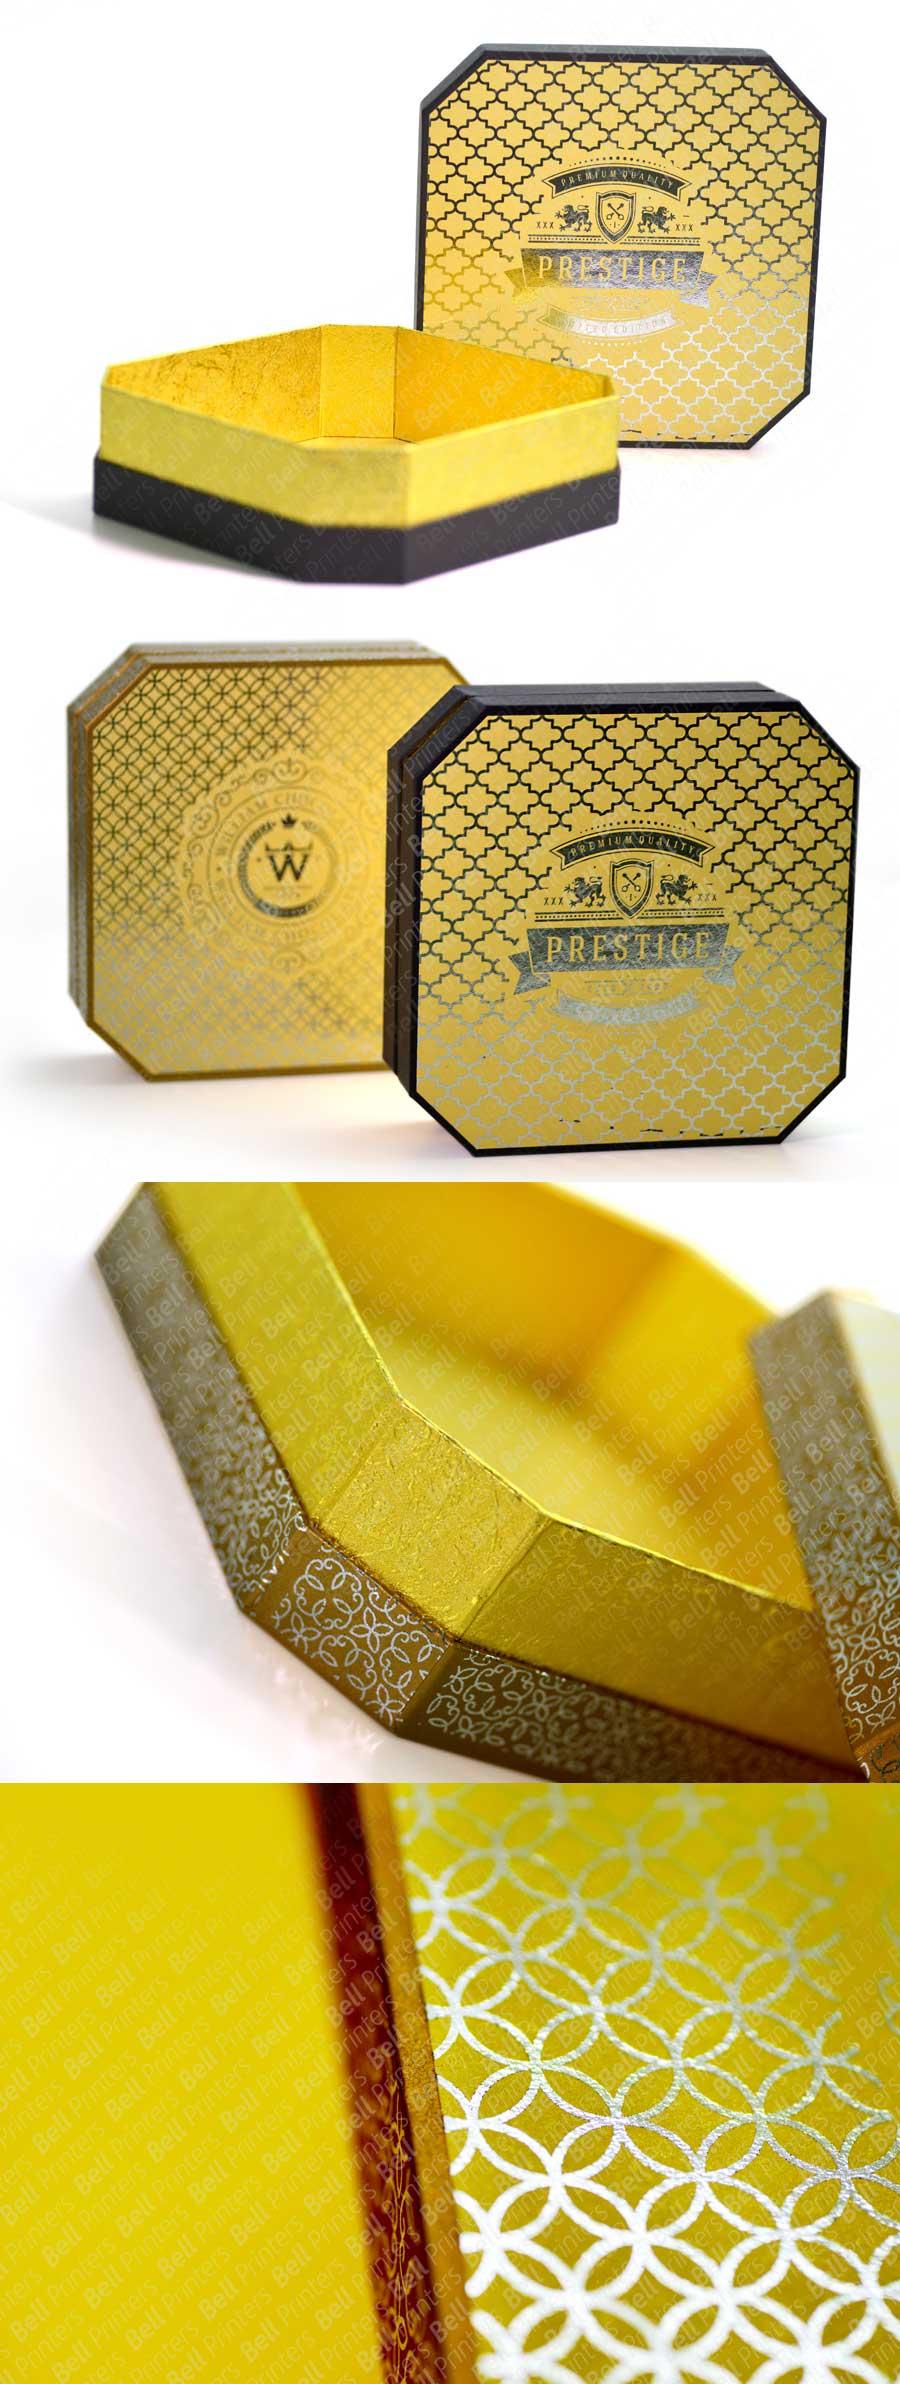 Innovative Octagonal Chocolate Gift Box   Luxury Chocolate Box